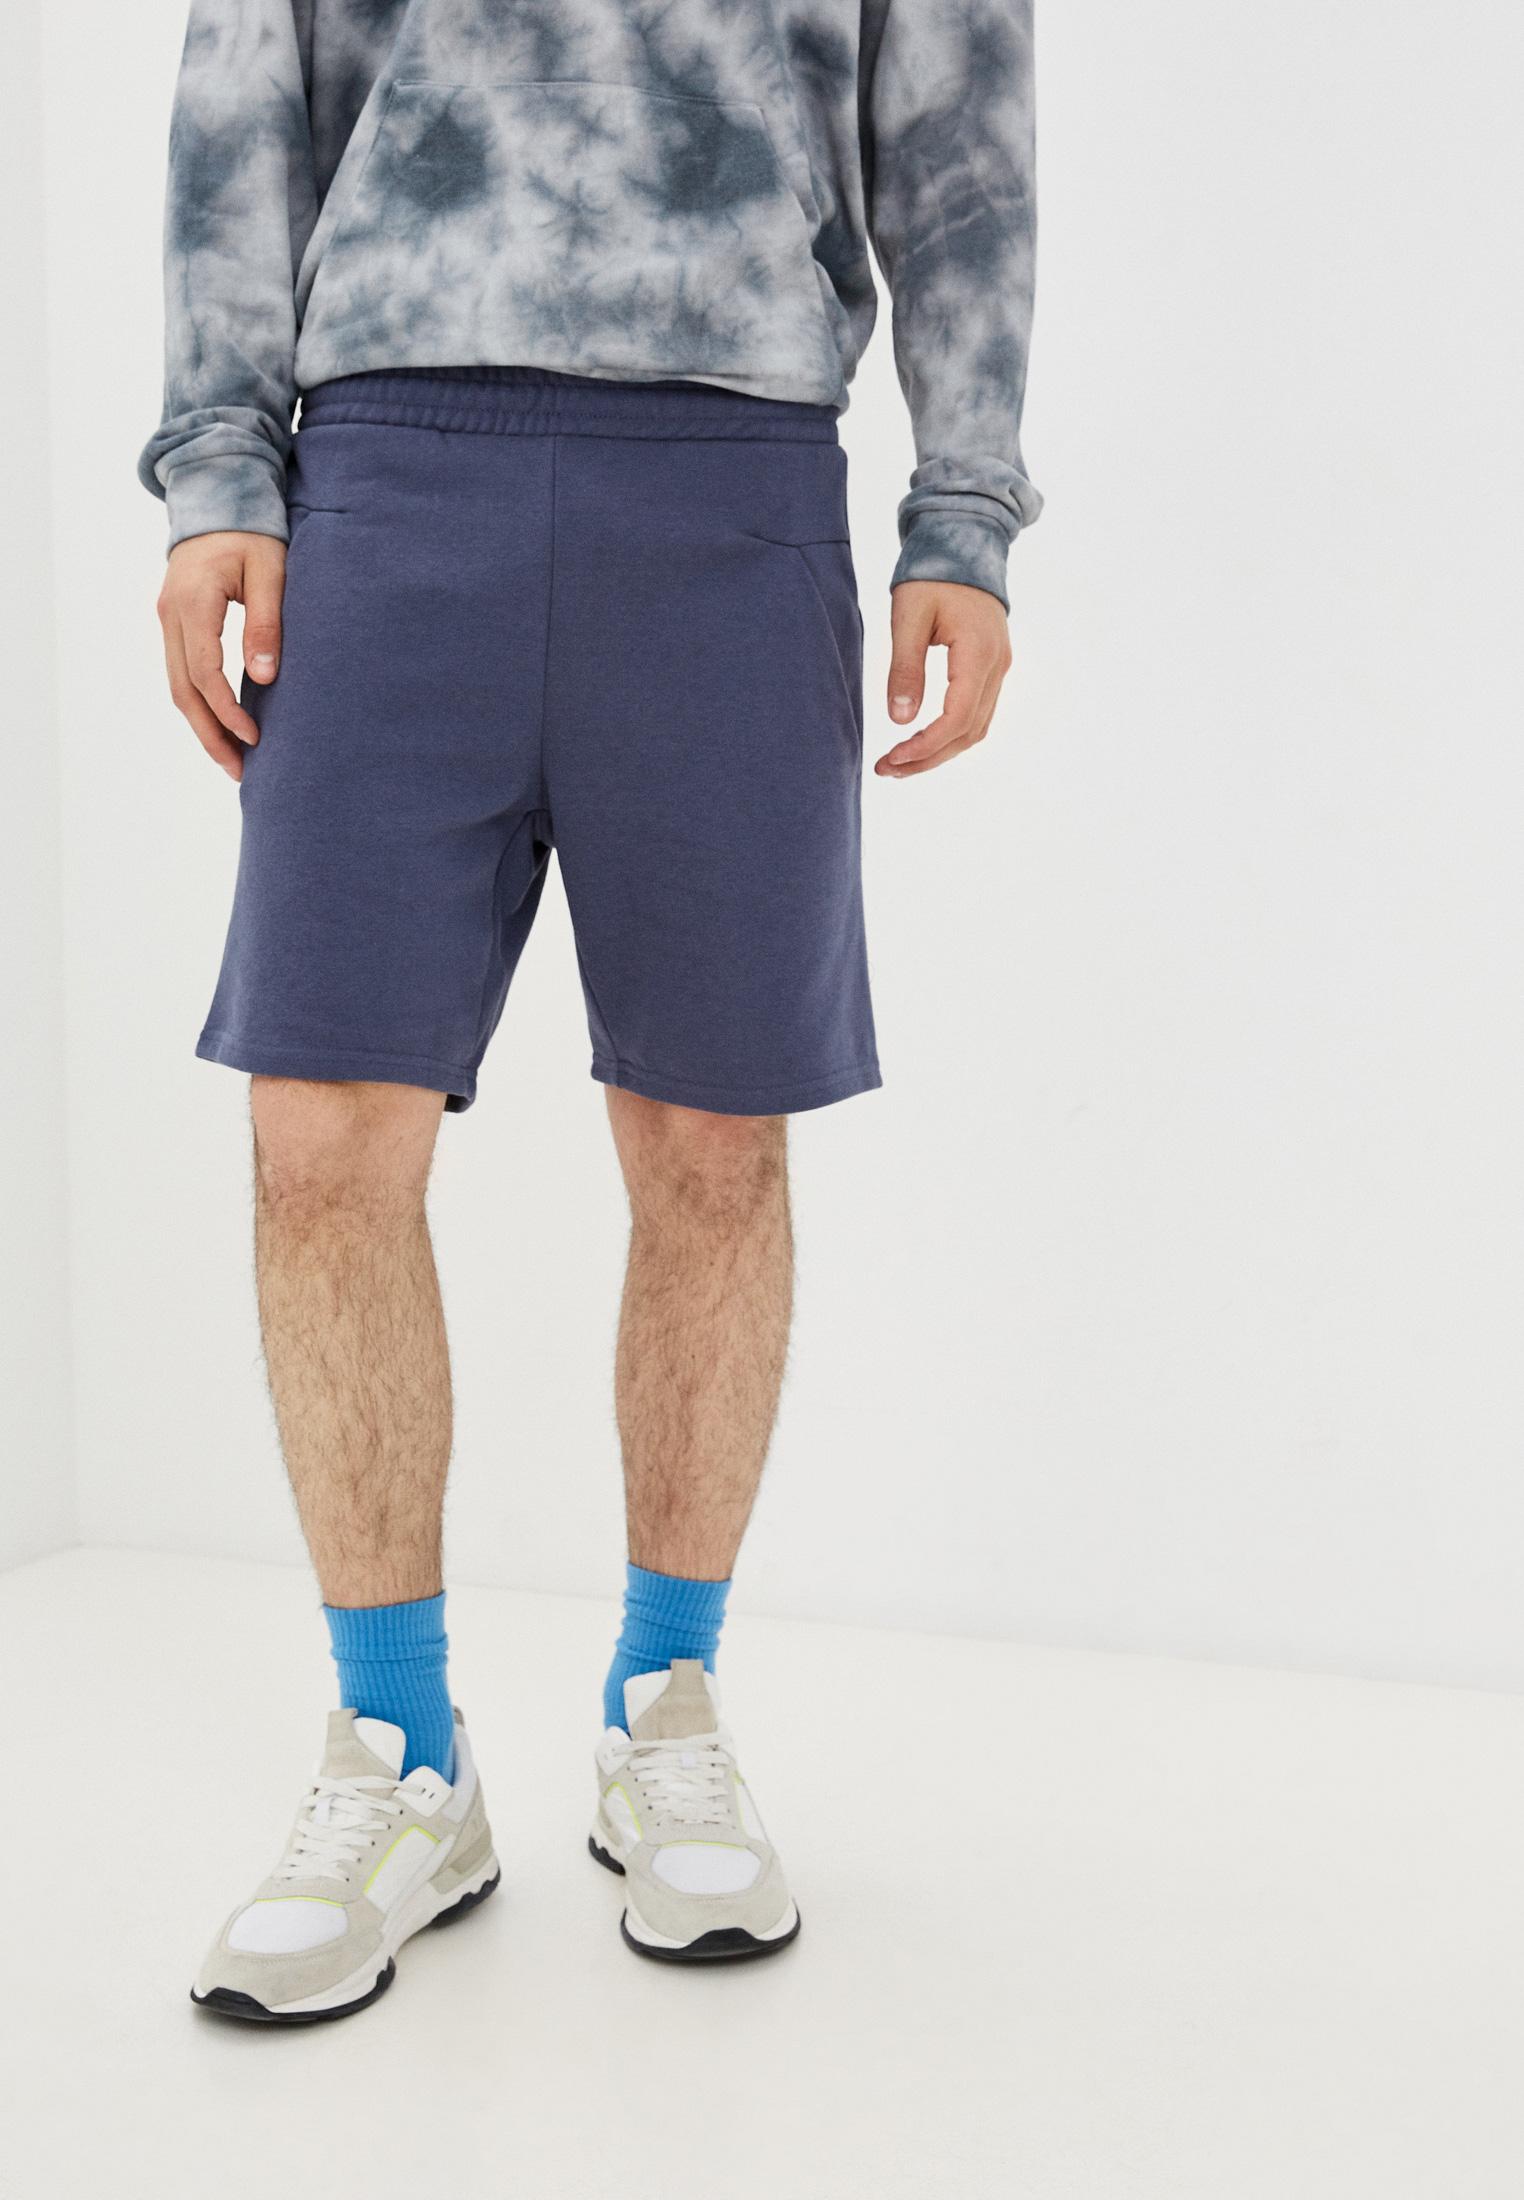 Мужские шорты Outhorn HOL21-SKMD601